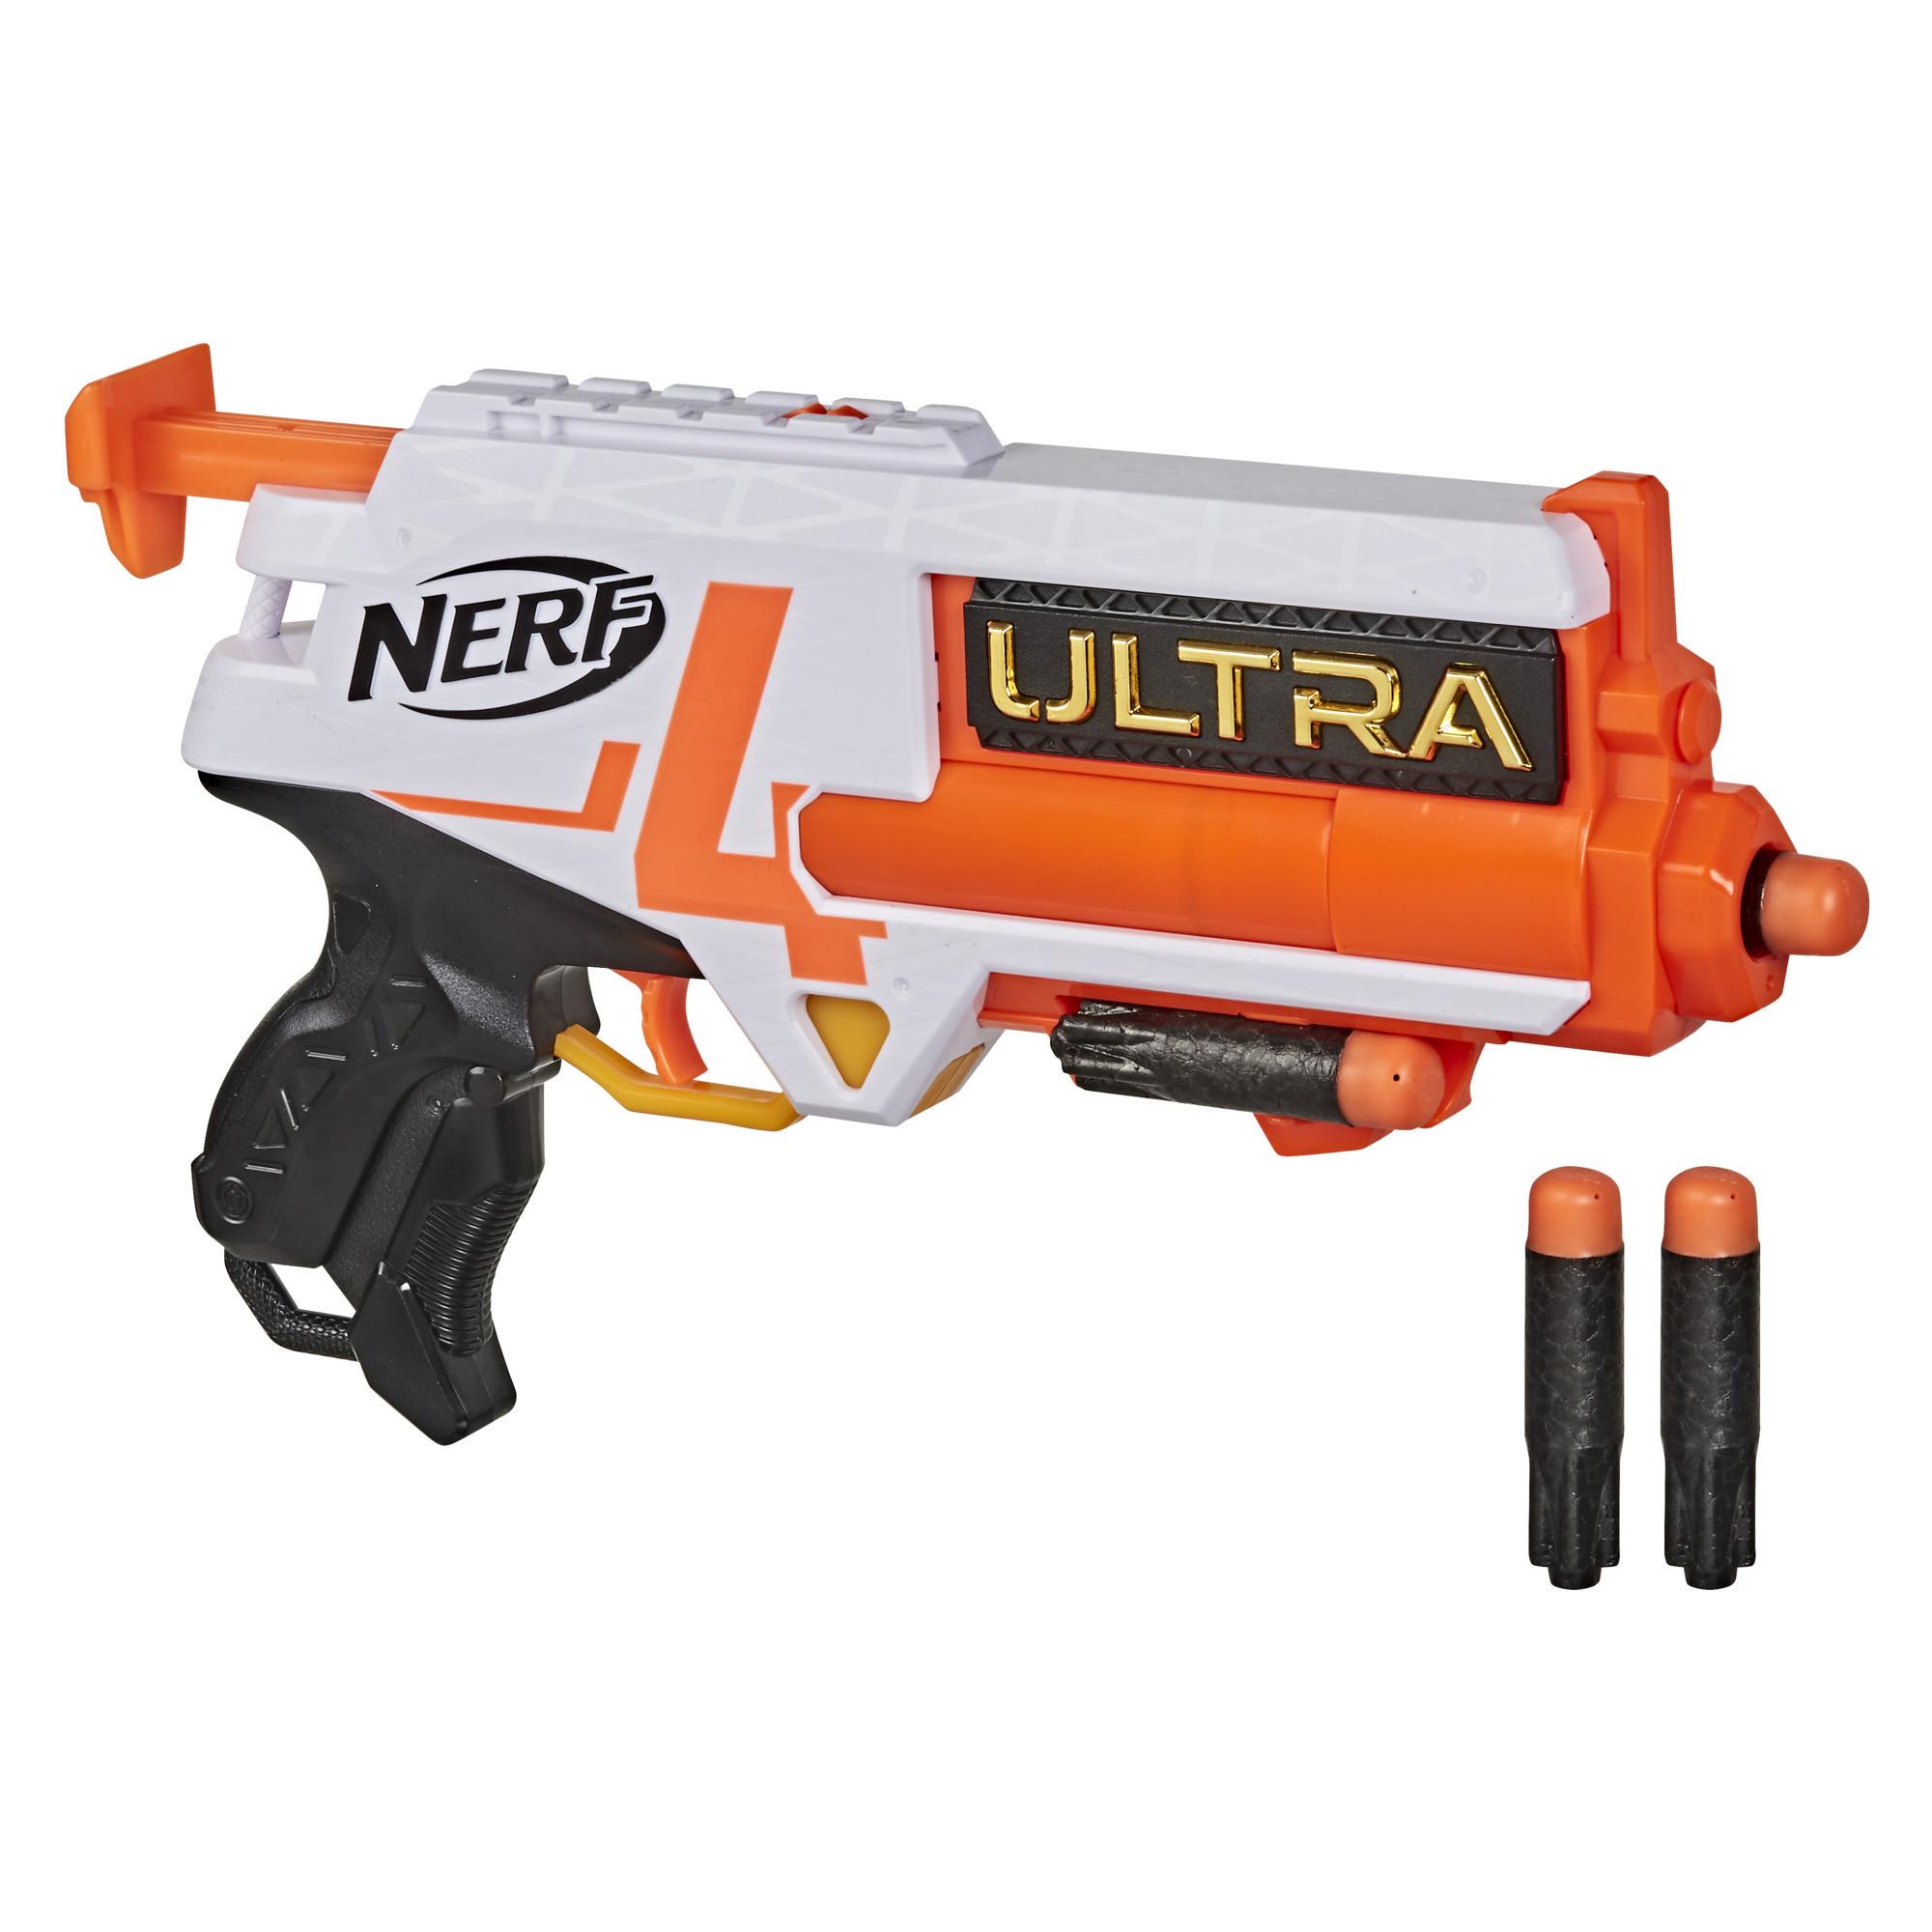 Nerf Ultra - Blaster Four, avec 4 fléchettes Nerf Ultra, compatible uniquement avec les fléchettes Nerf Ultra